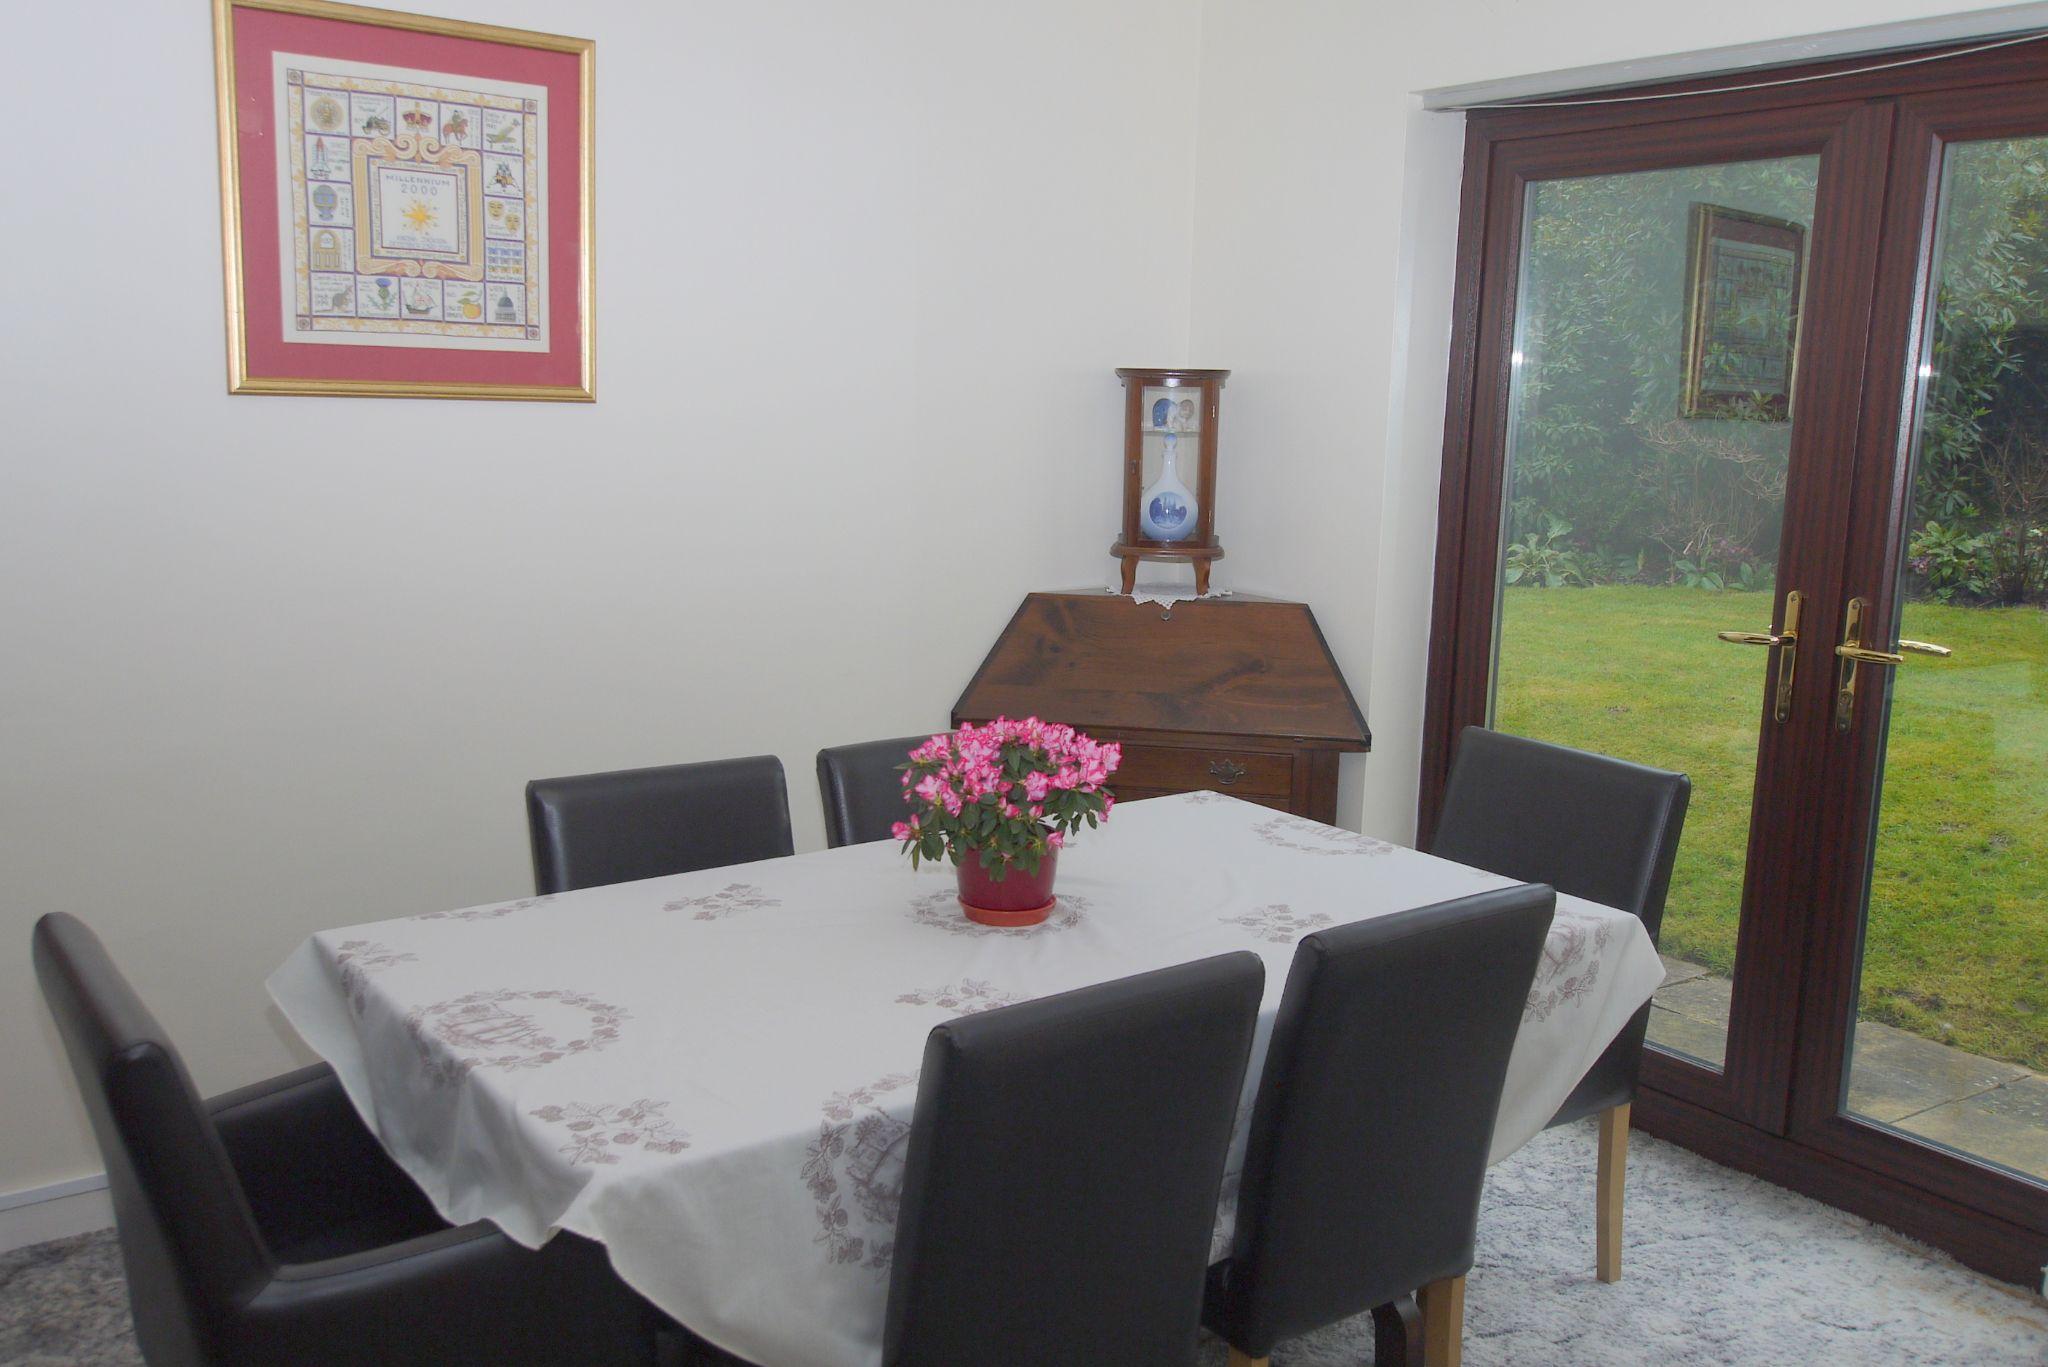 4 bedroom detached house Sold in Sevenoaks - Photograph 3